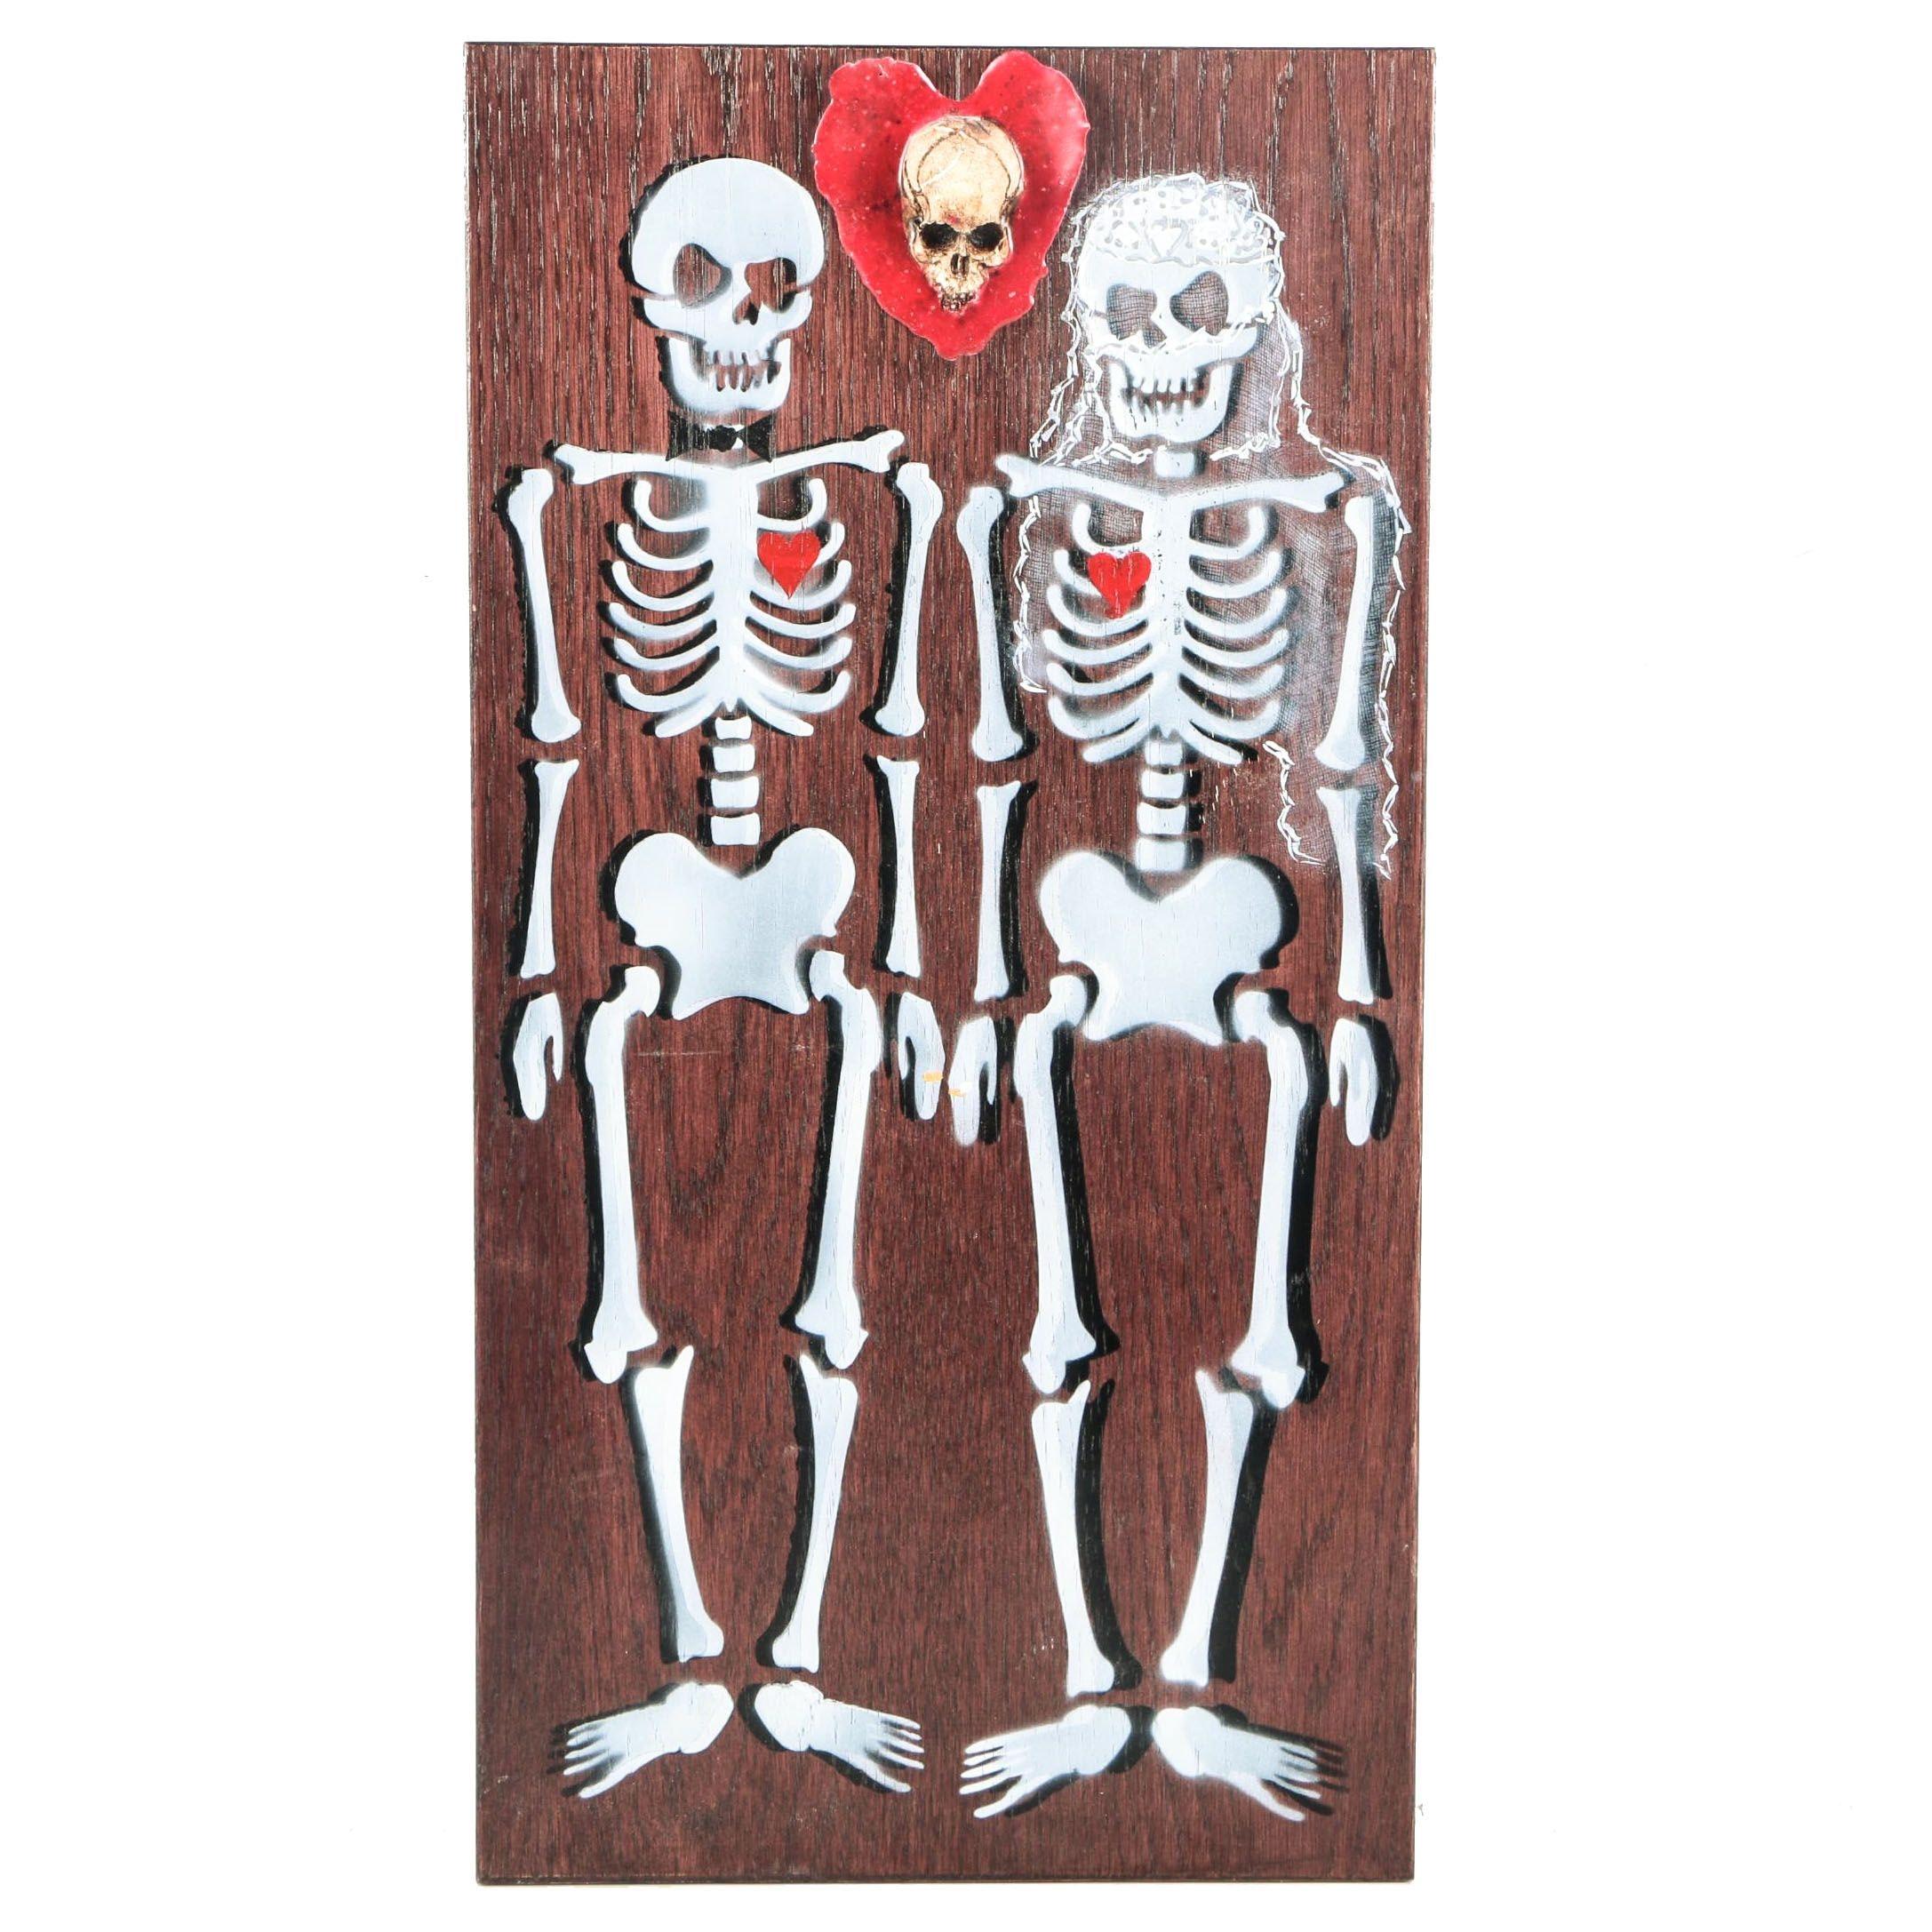 Halloween Decor Featuring a Skeleton Wedding